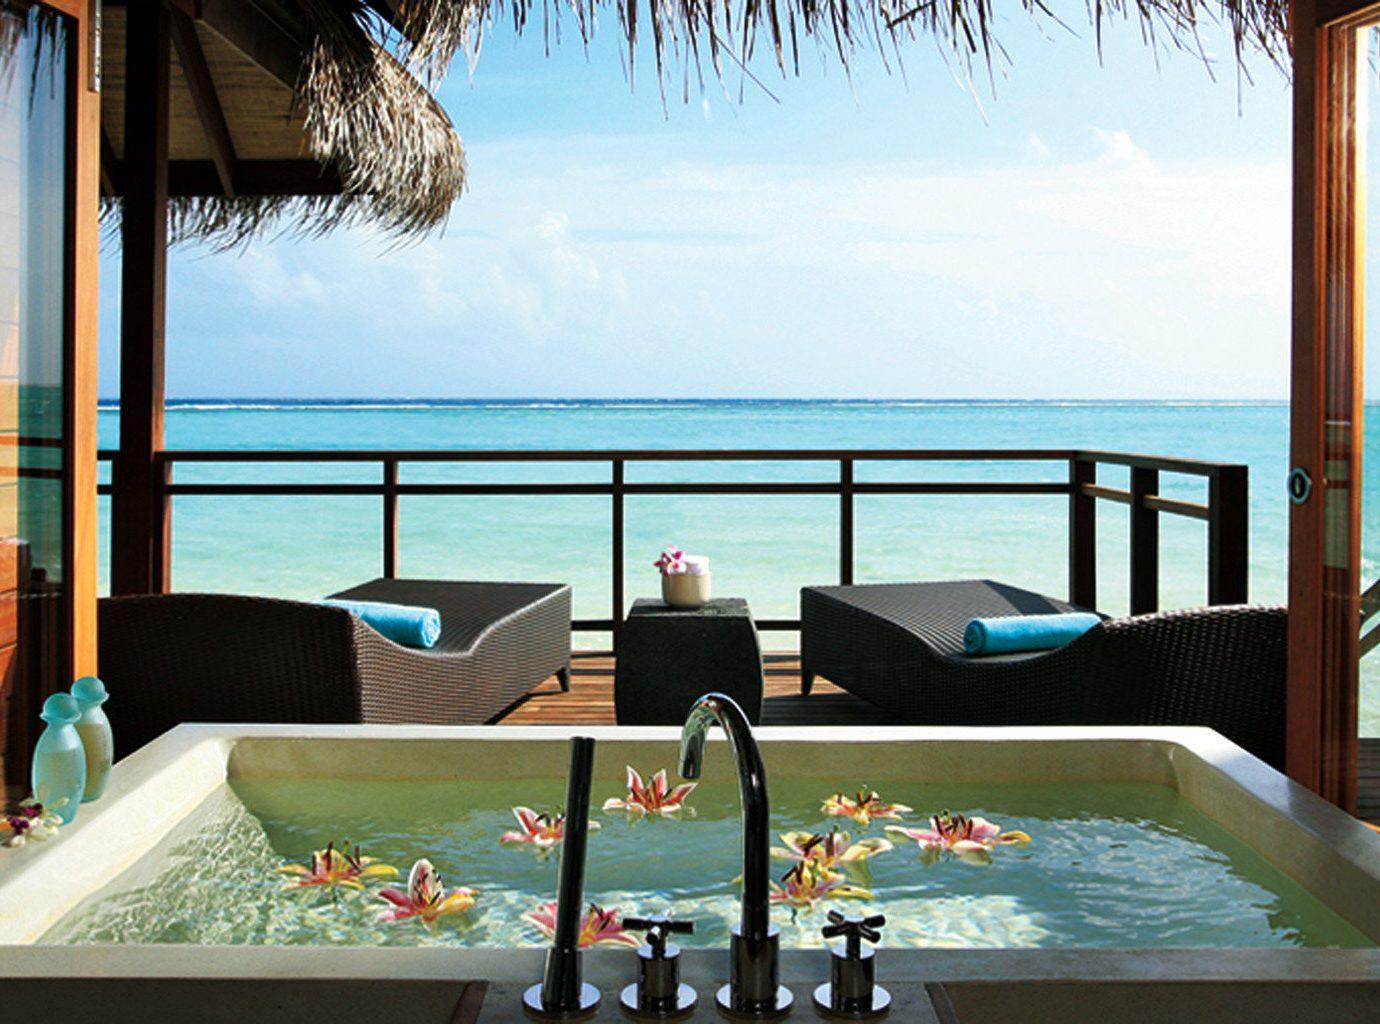 Outdoor bathtub at LUX* South Ari Atoll